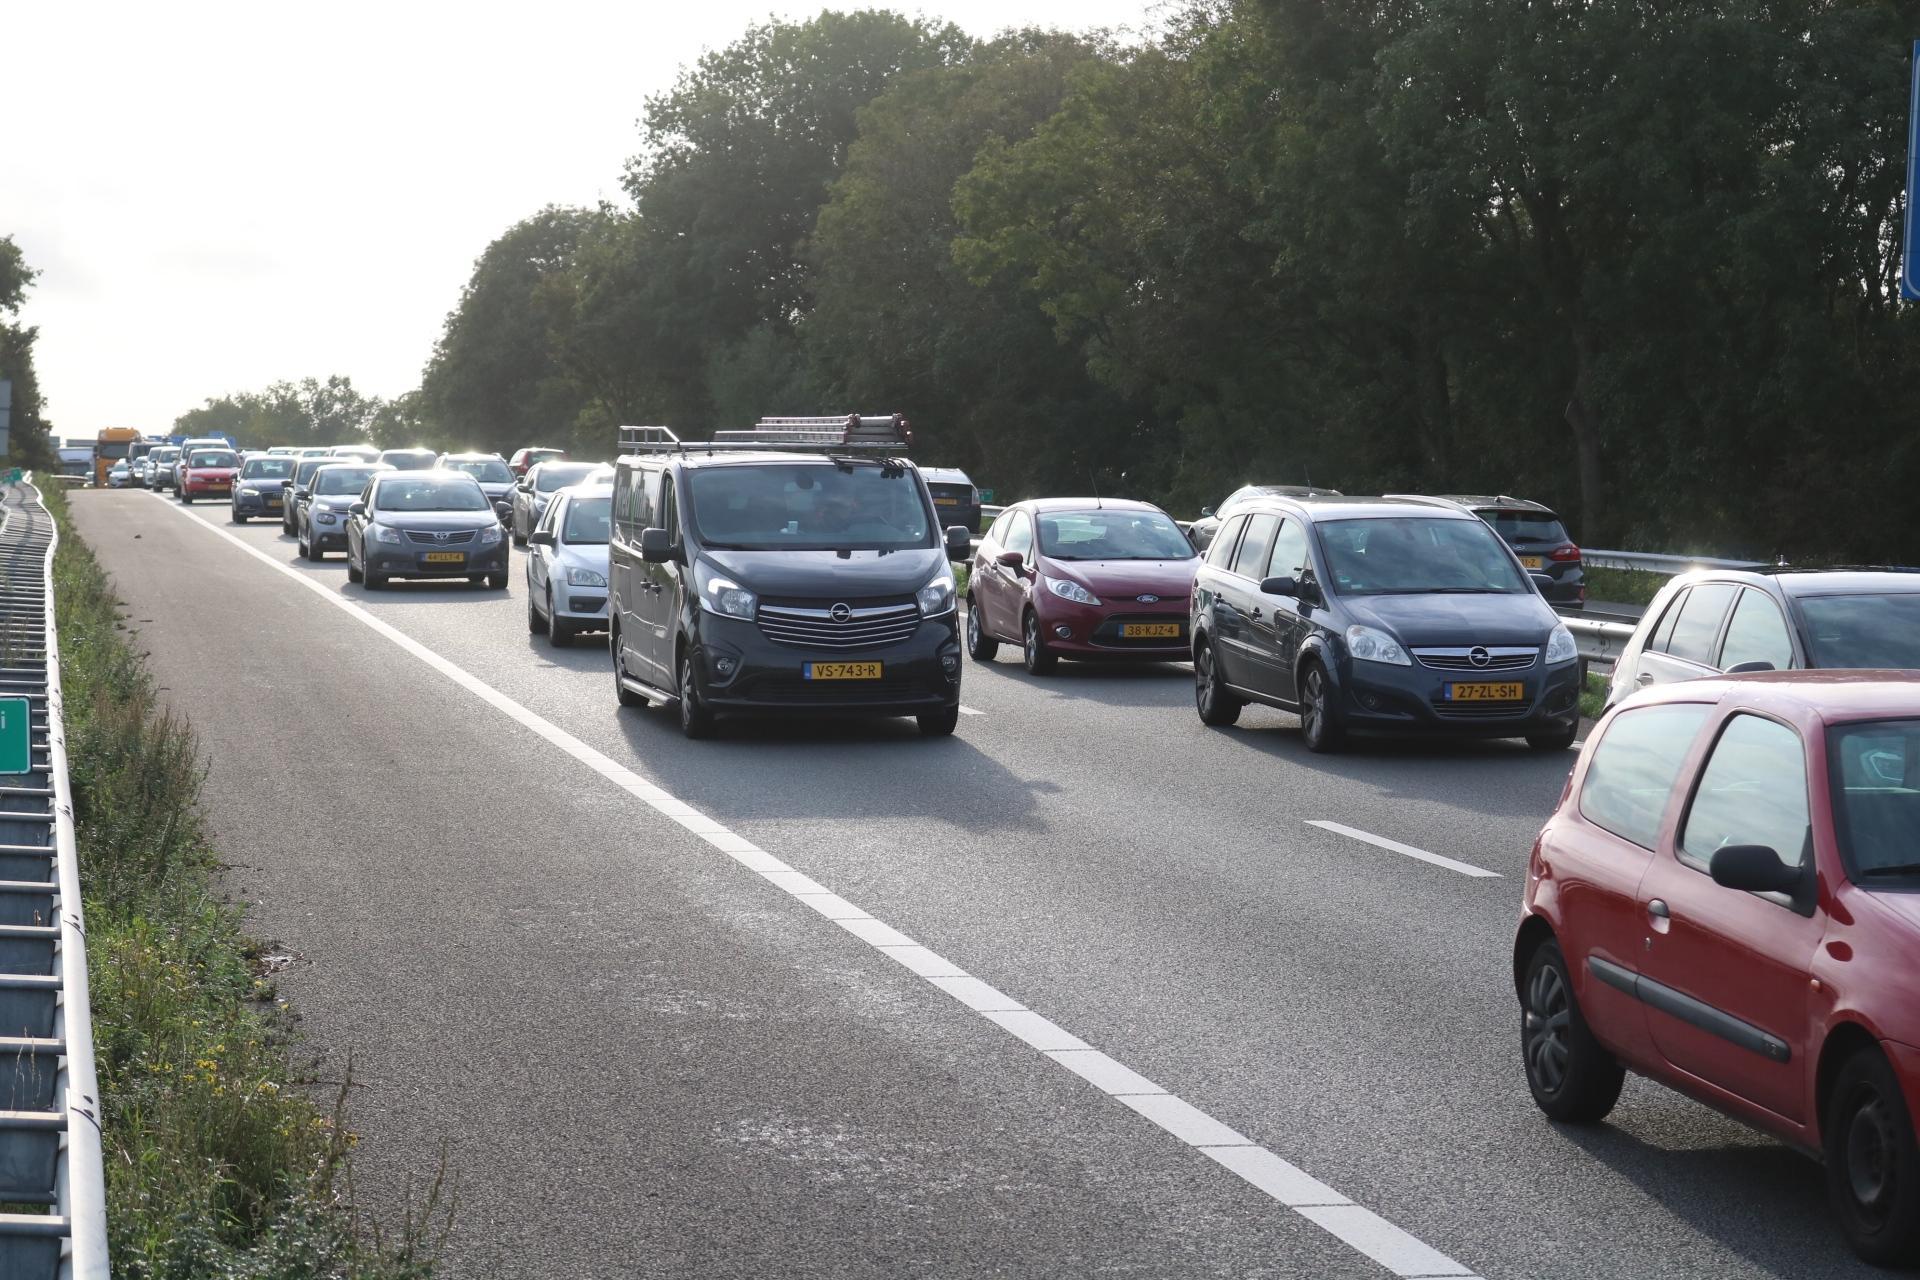 Flinke file na ongeluk op de A44 bij Sassenheim